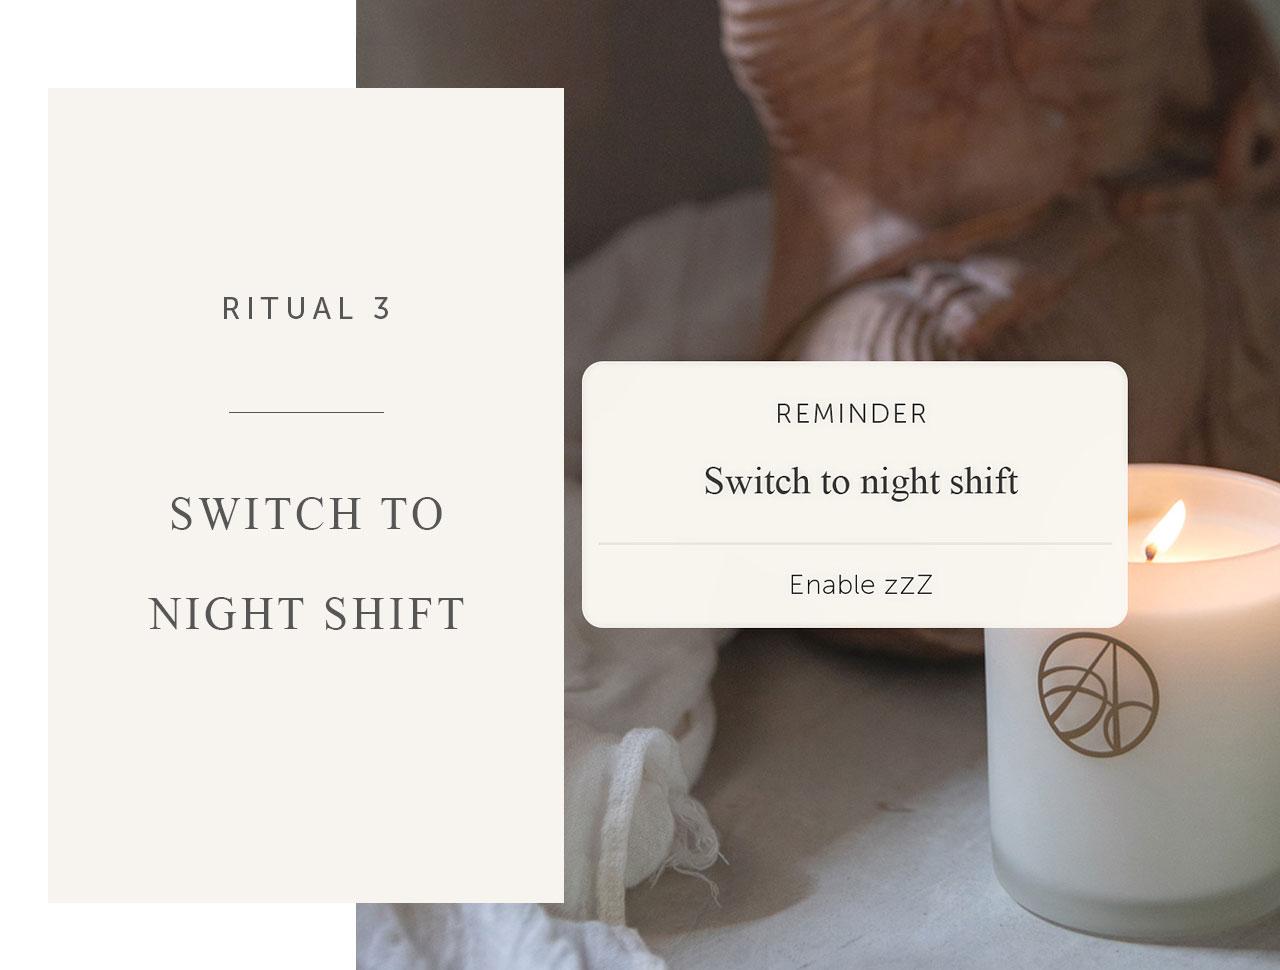 Bedtime ritual 3